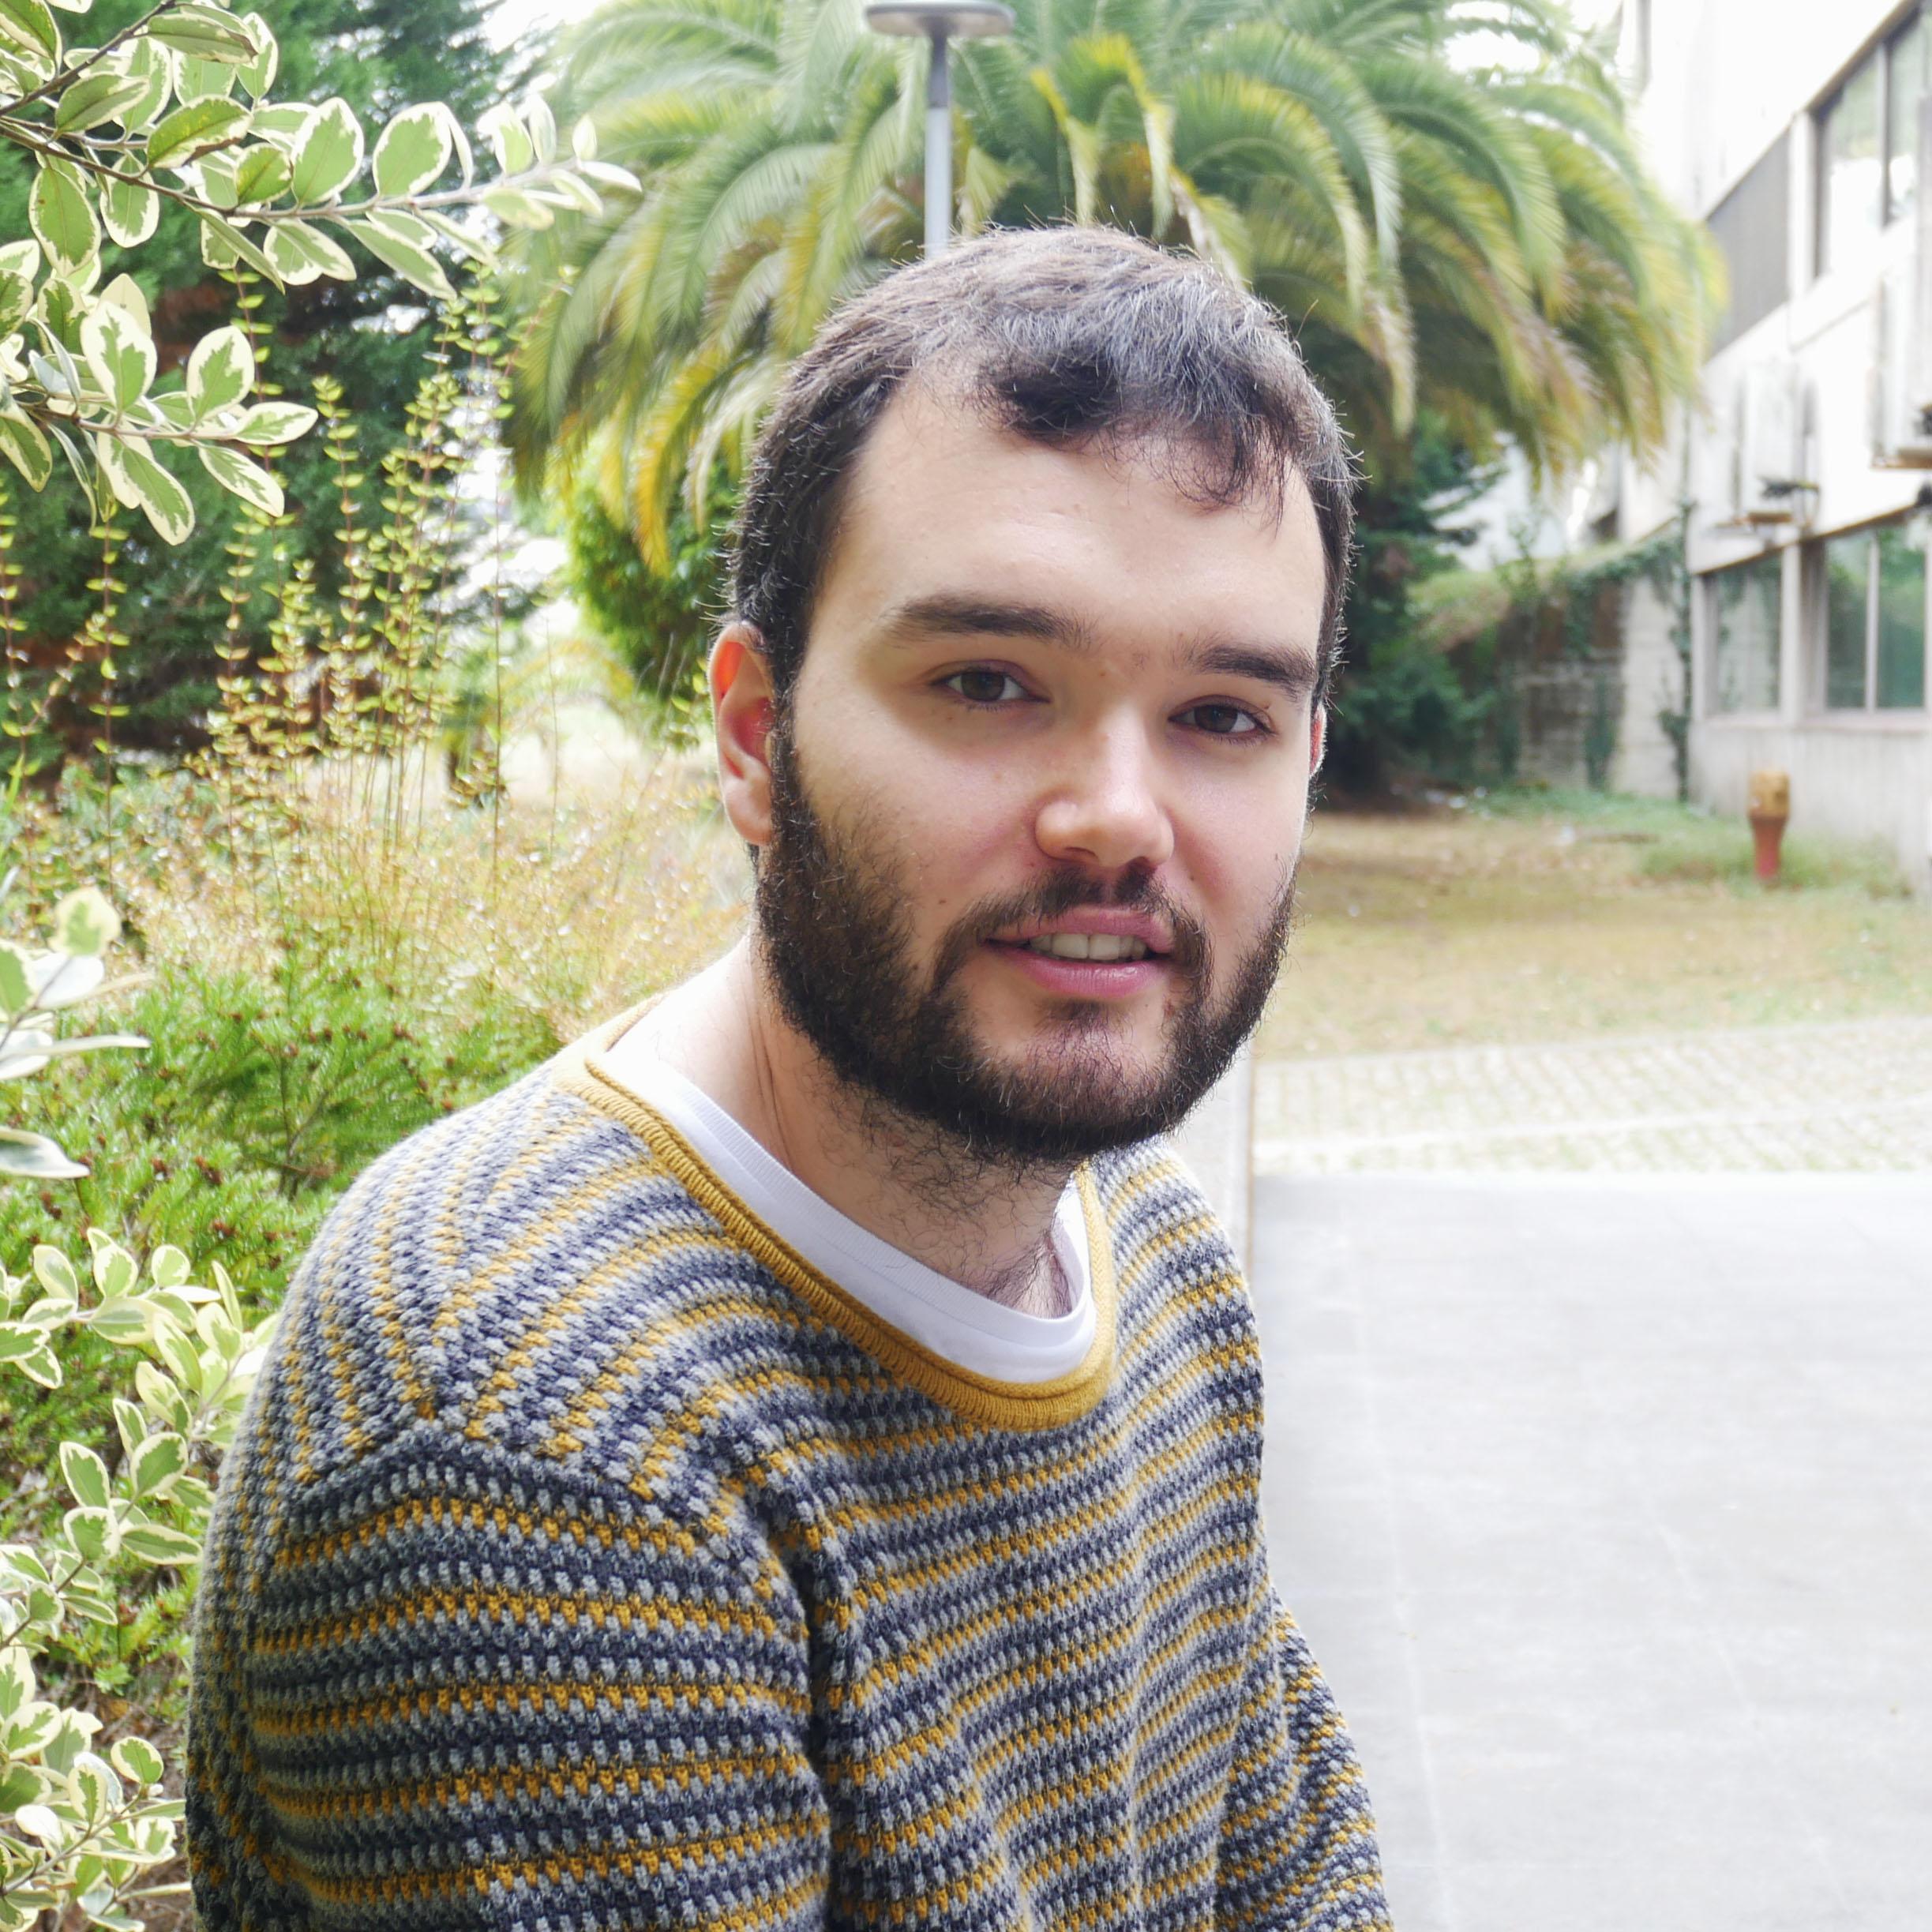 Casais Vidal, Adrián